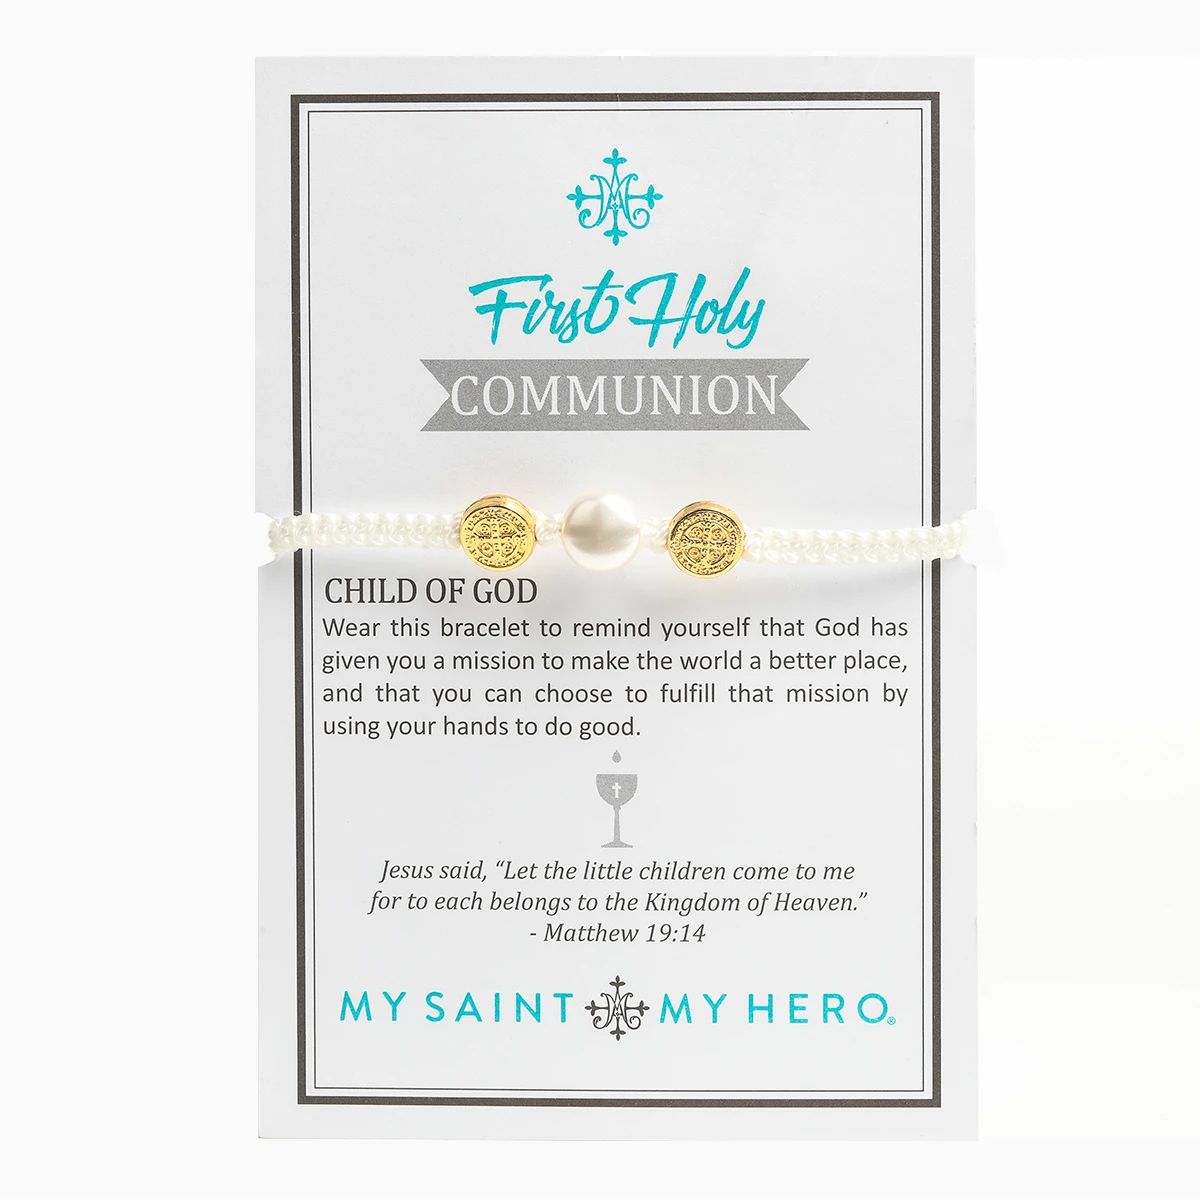 First Holy Communion Blessing Bracelet (Gold)